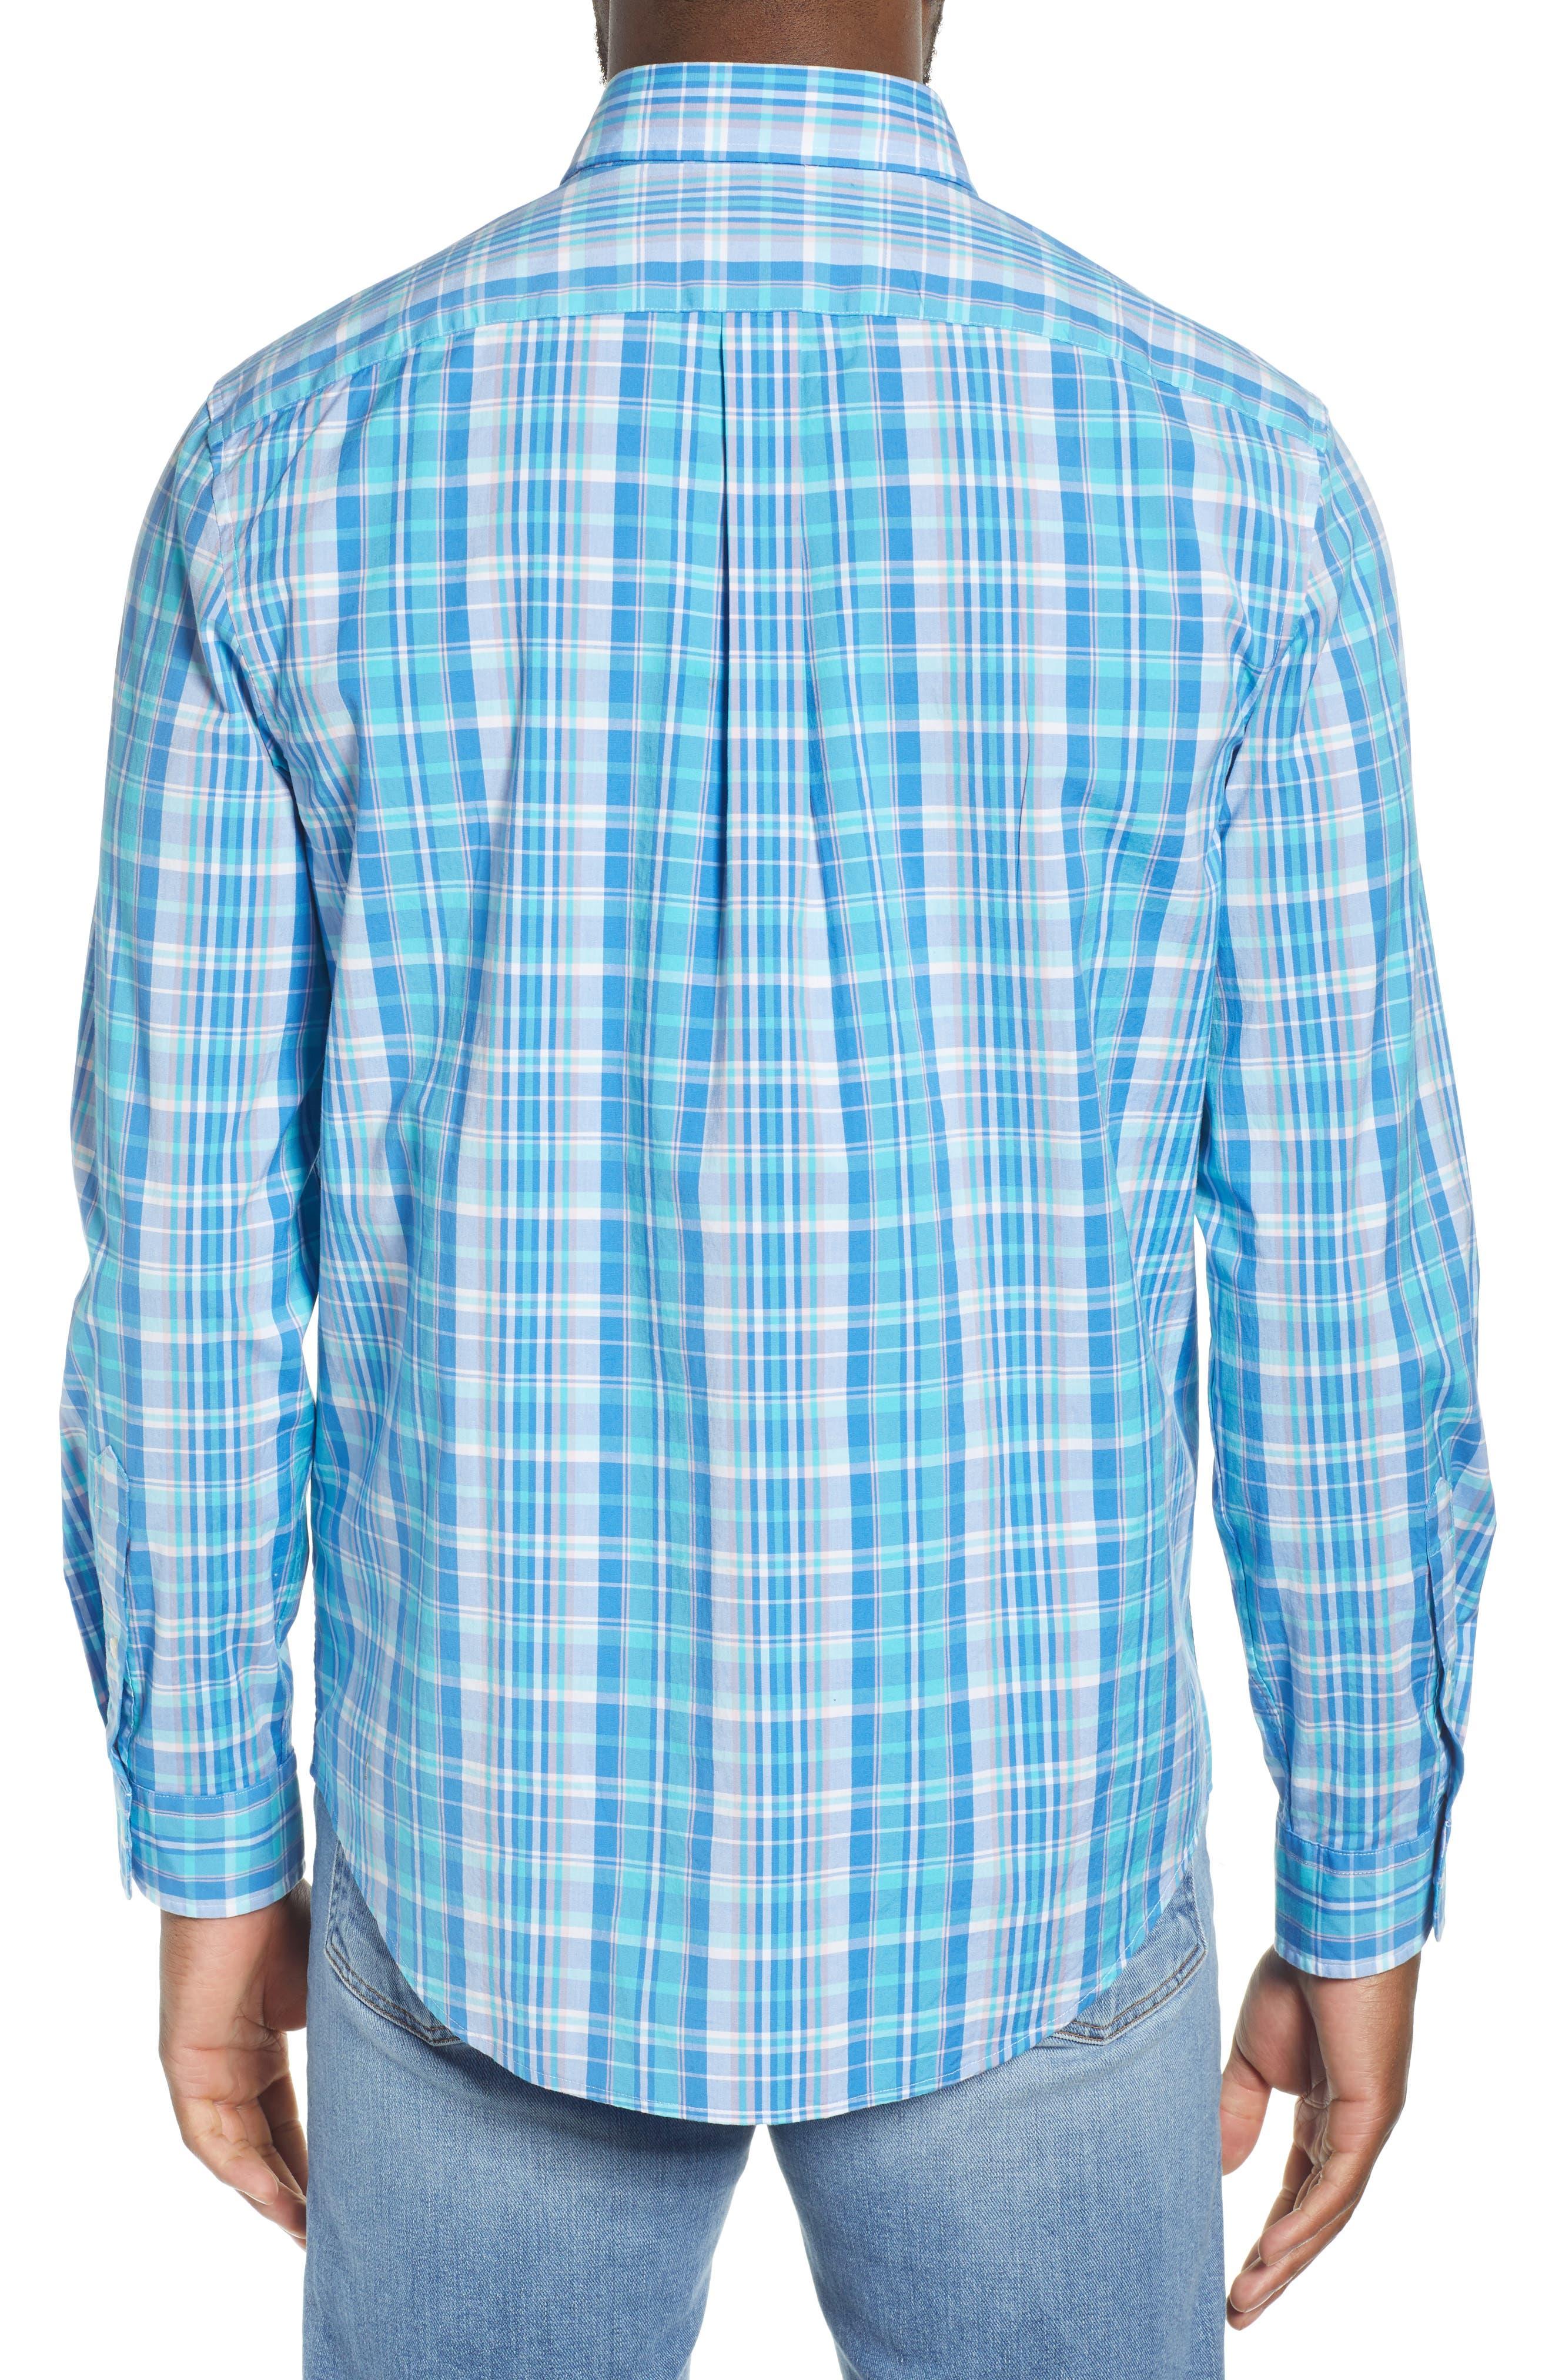 VINEYARD VINES, Tucker Regular Fit Plaid Sport Shirt, Alternate thumbnail 3, color, JAKE BLUE